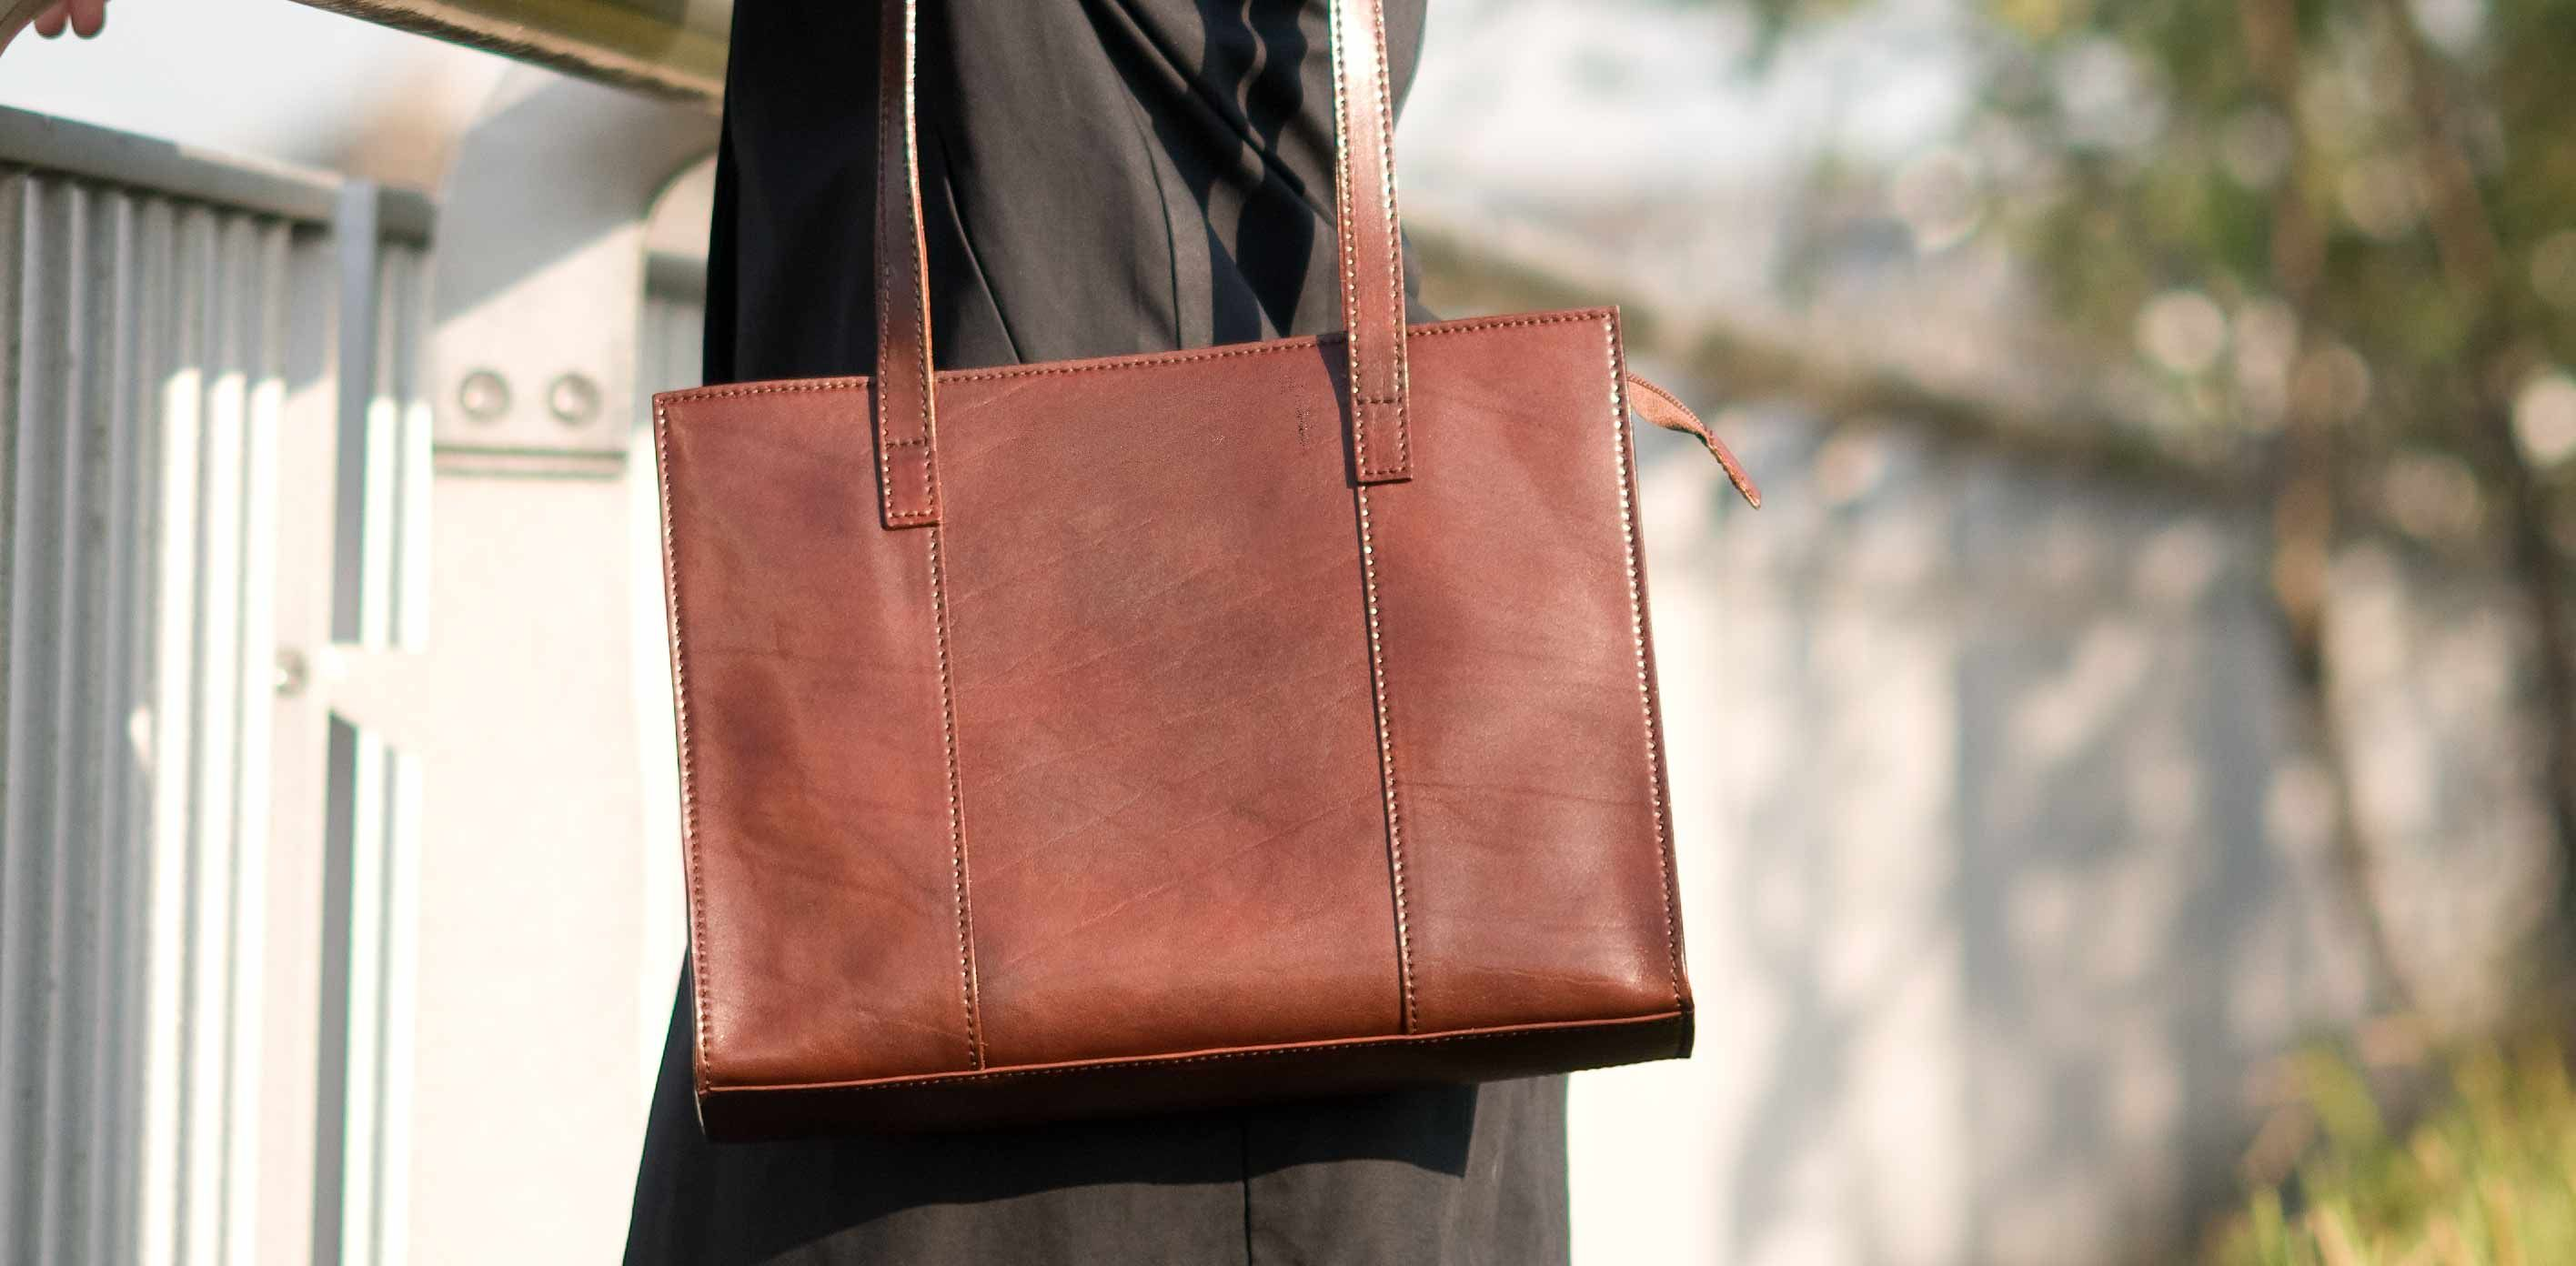 The Scala Las Italian Leather Work Bag